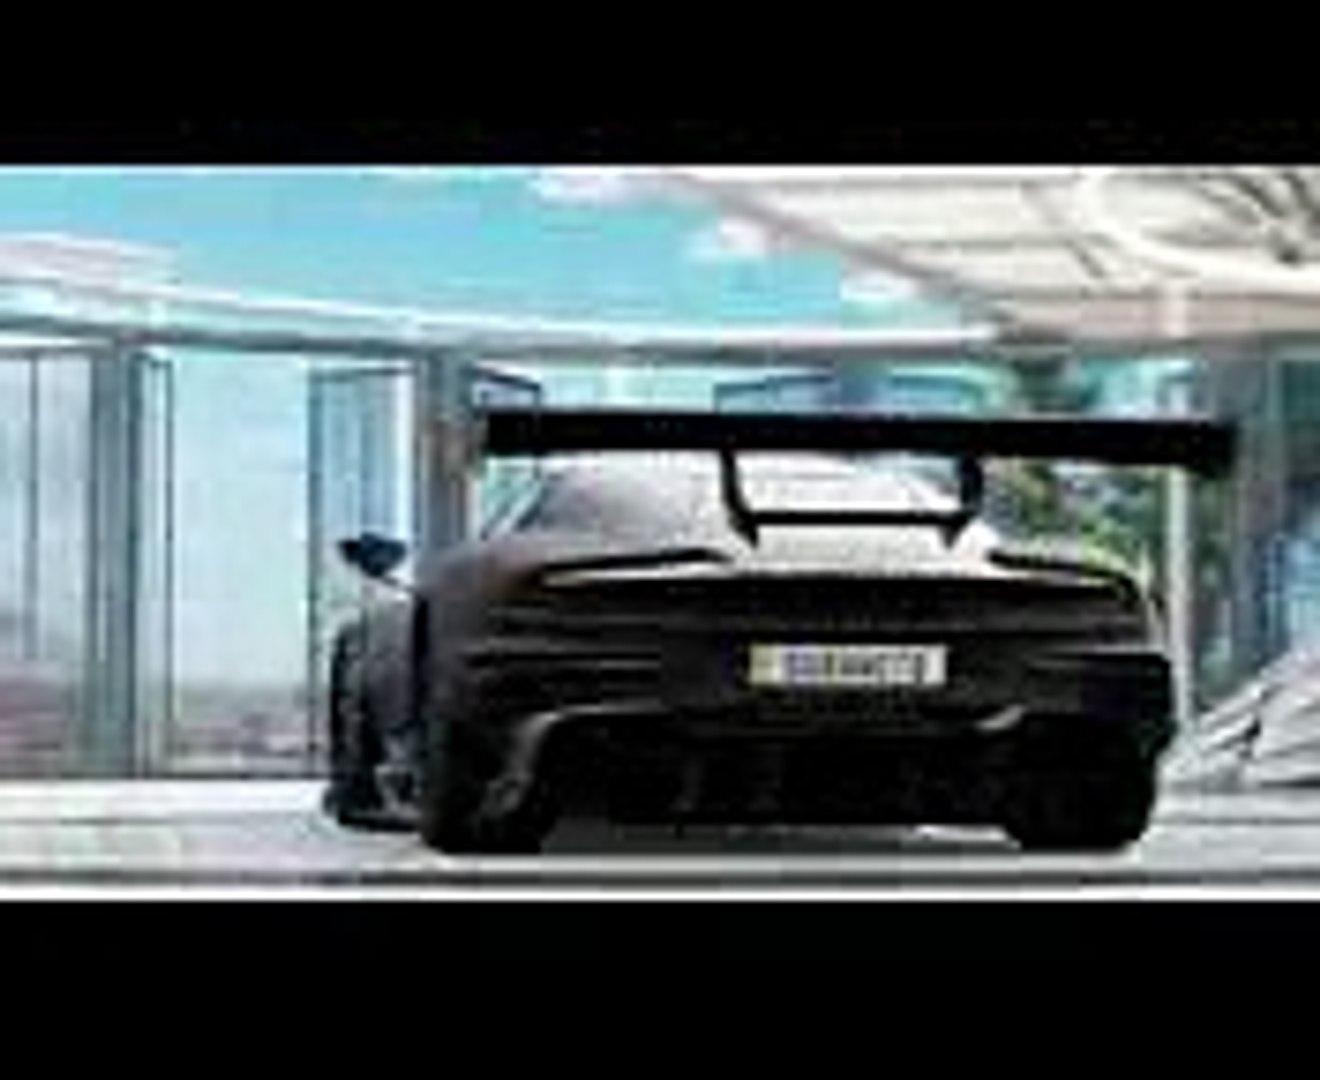 Pagani Huayra Bc Vs Aston Martin Vulcan Drag Race Forza Horizon 3 Video Dailymotion